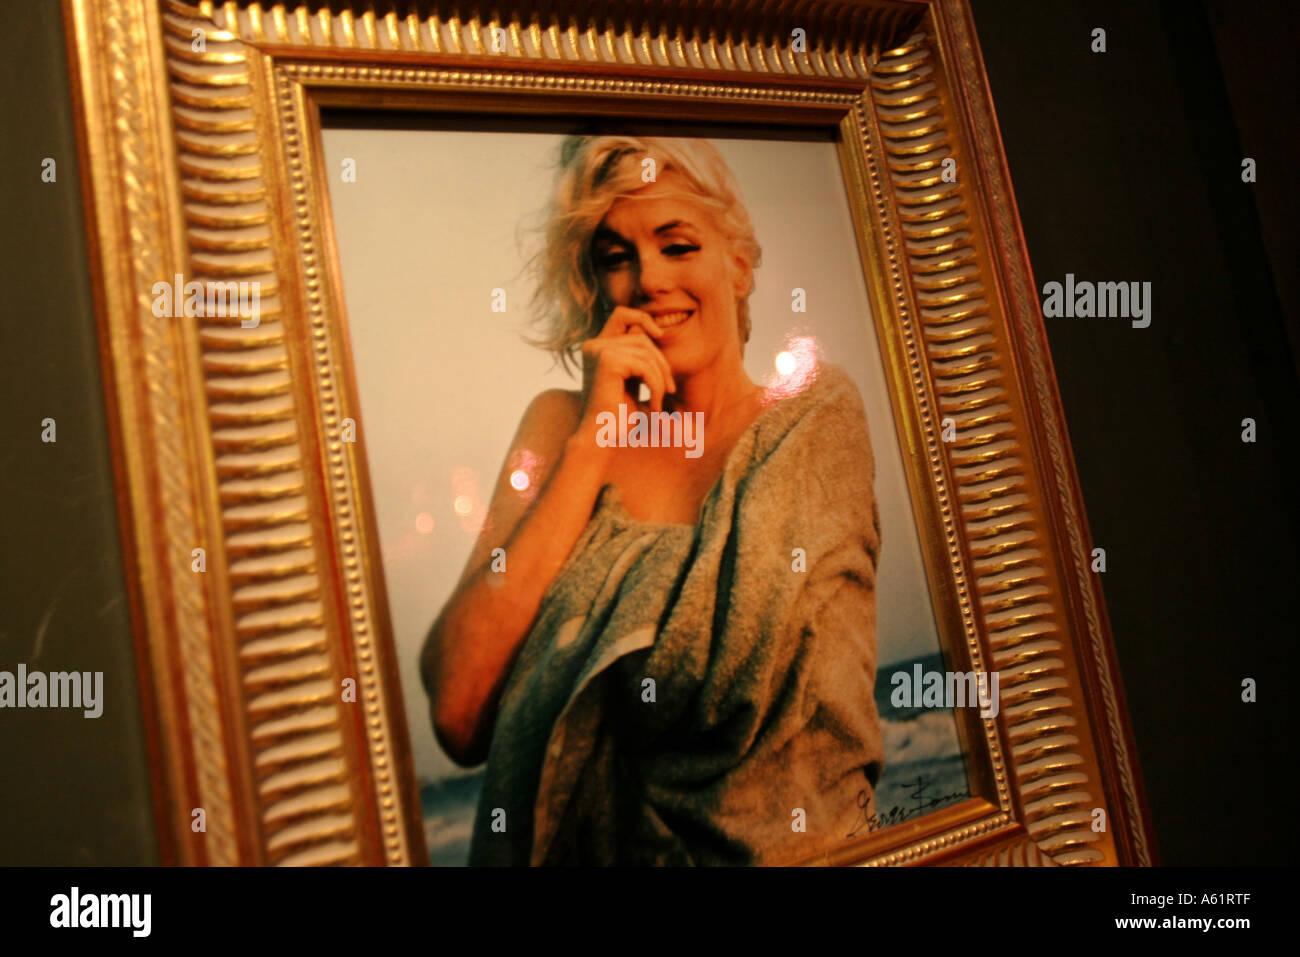 Marilyn Monroe portrait Museo Nazionale del Cinema Turin Piedmont Italy - Stock Image